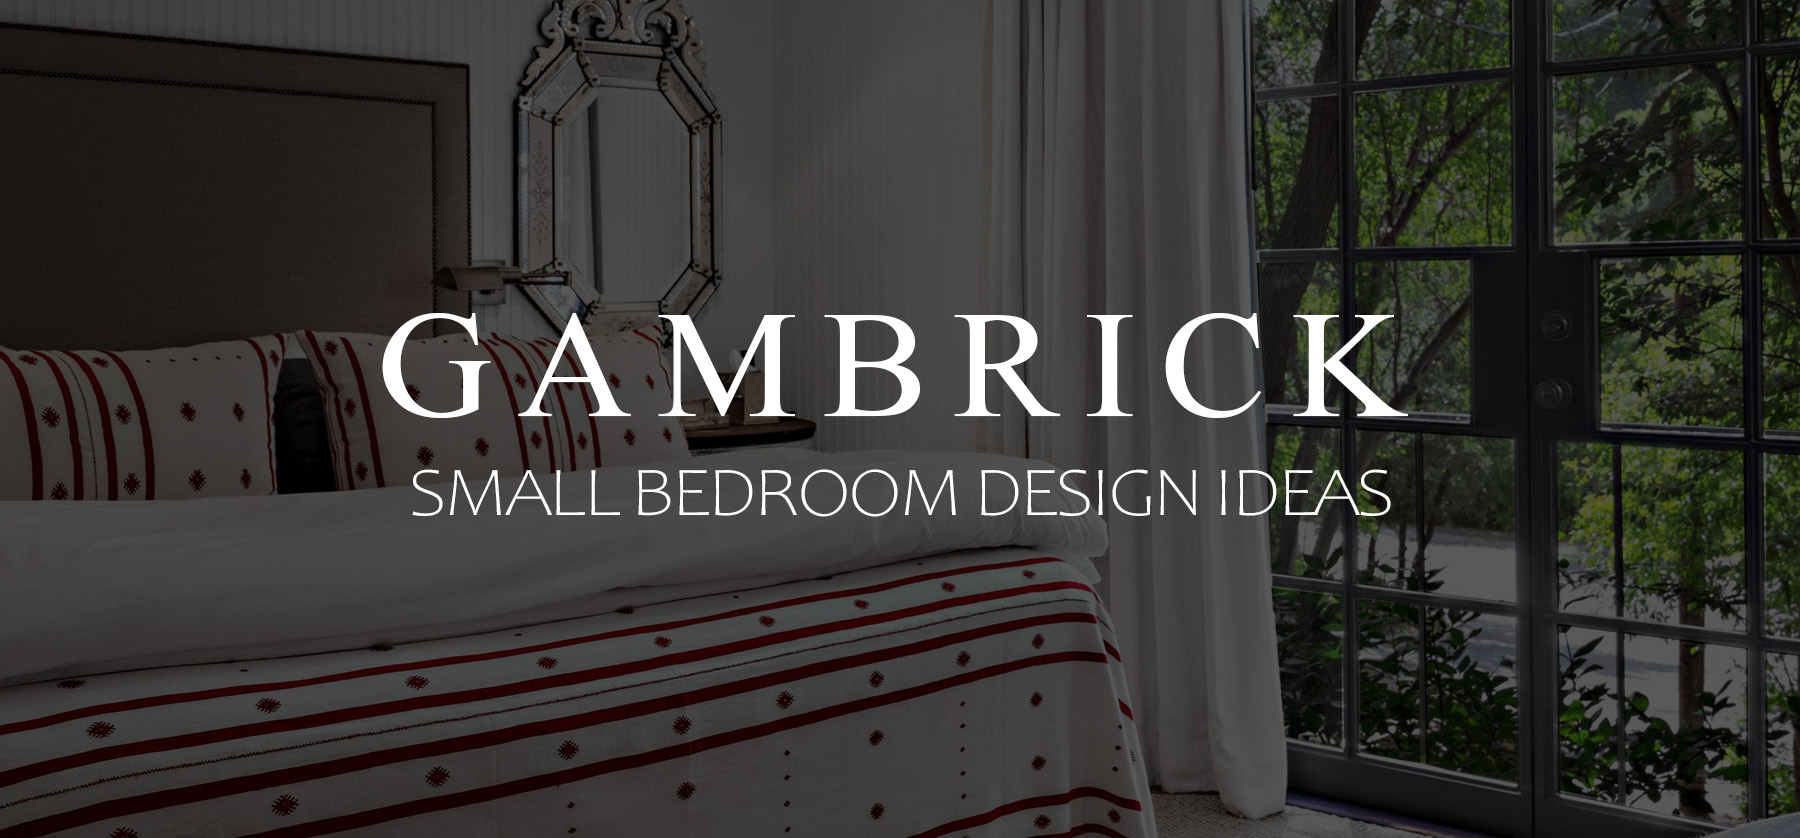 small bedroom design ideas banner 1